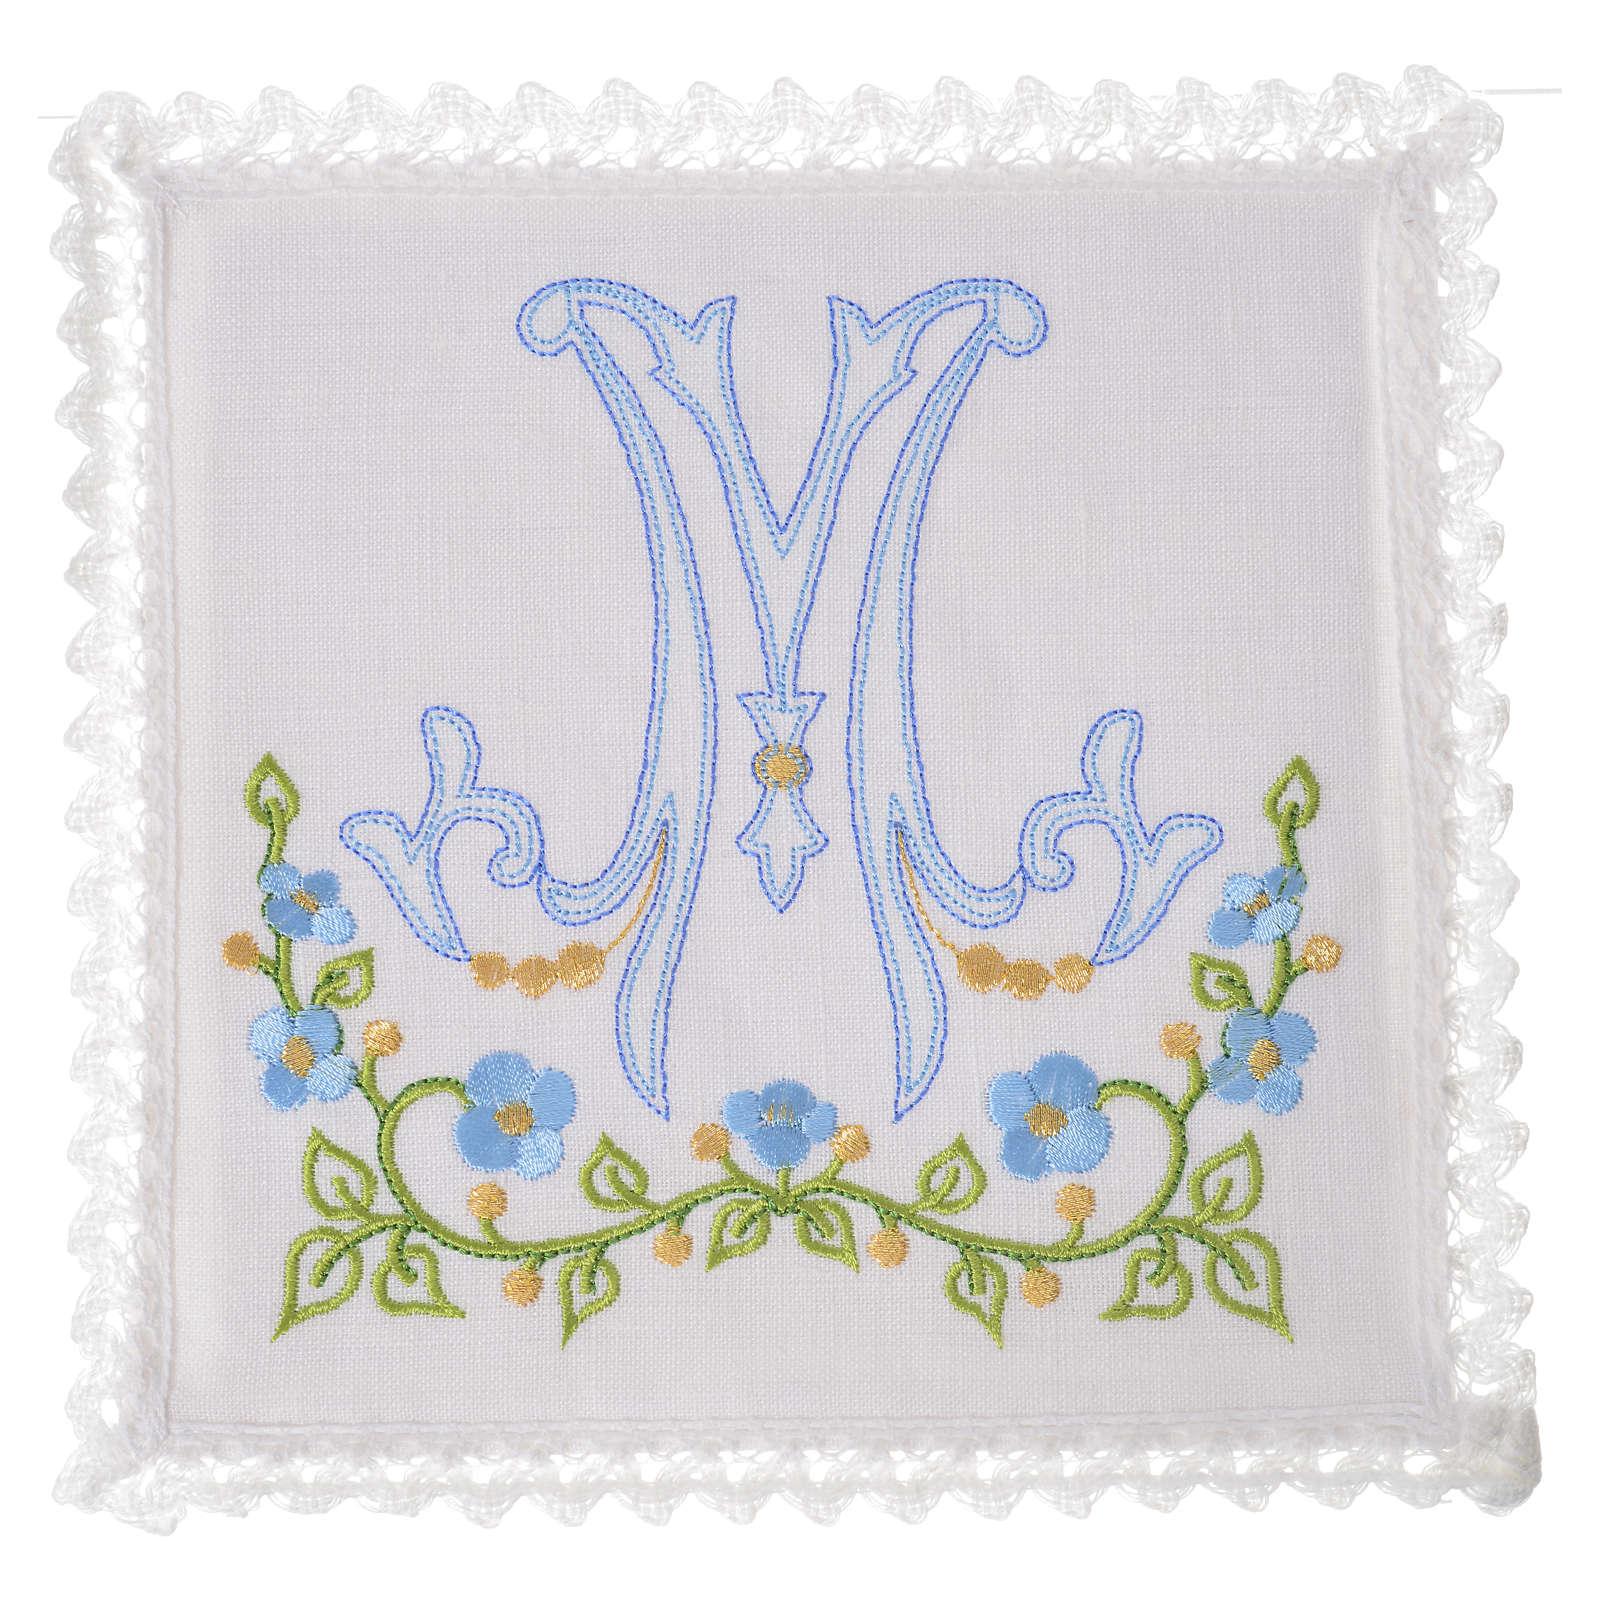 Altar linens set, 100% linen with Marian M 4